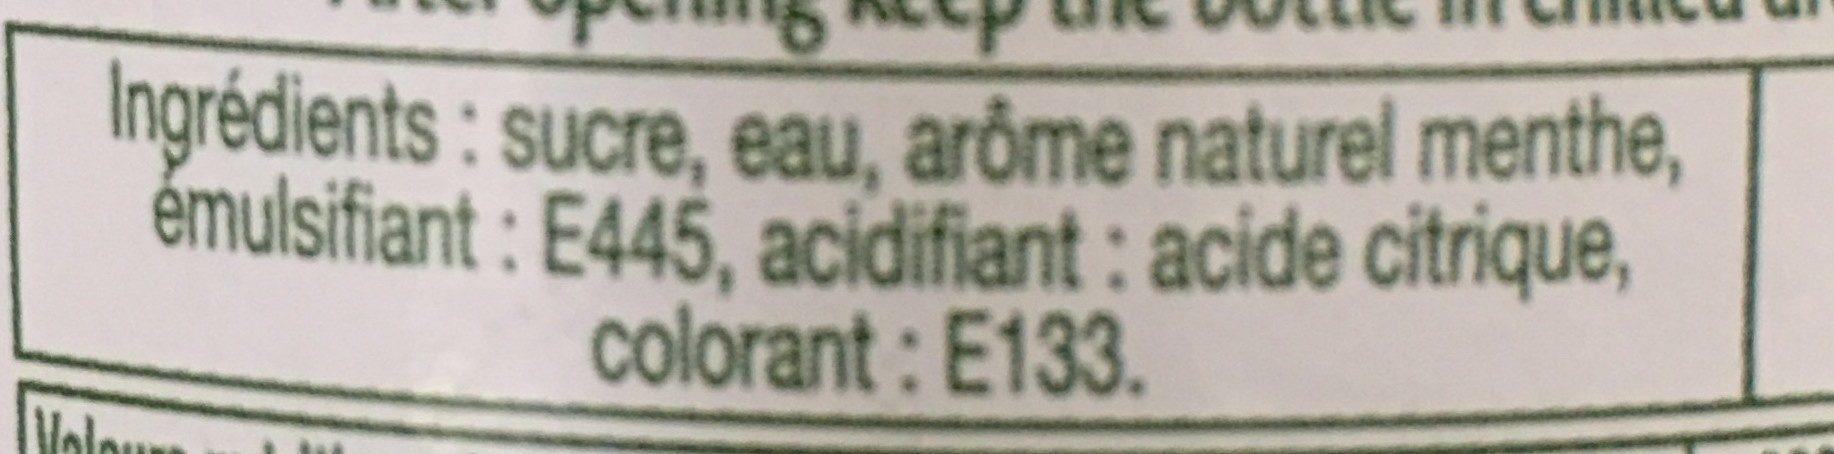 Menthe Glaciale - Ingrediënten - fr